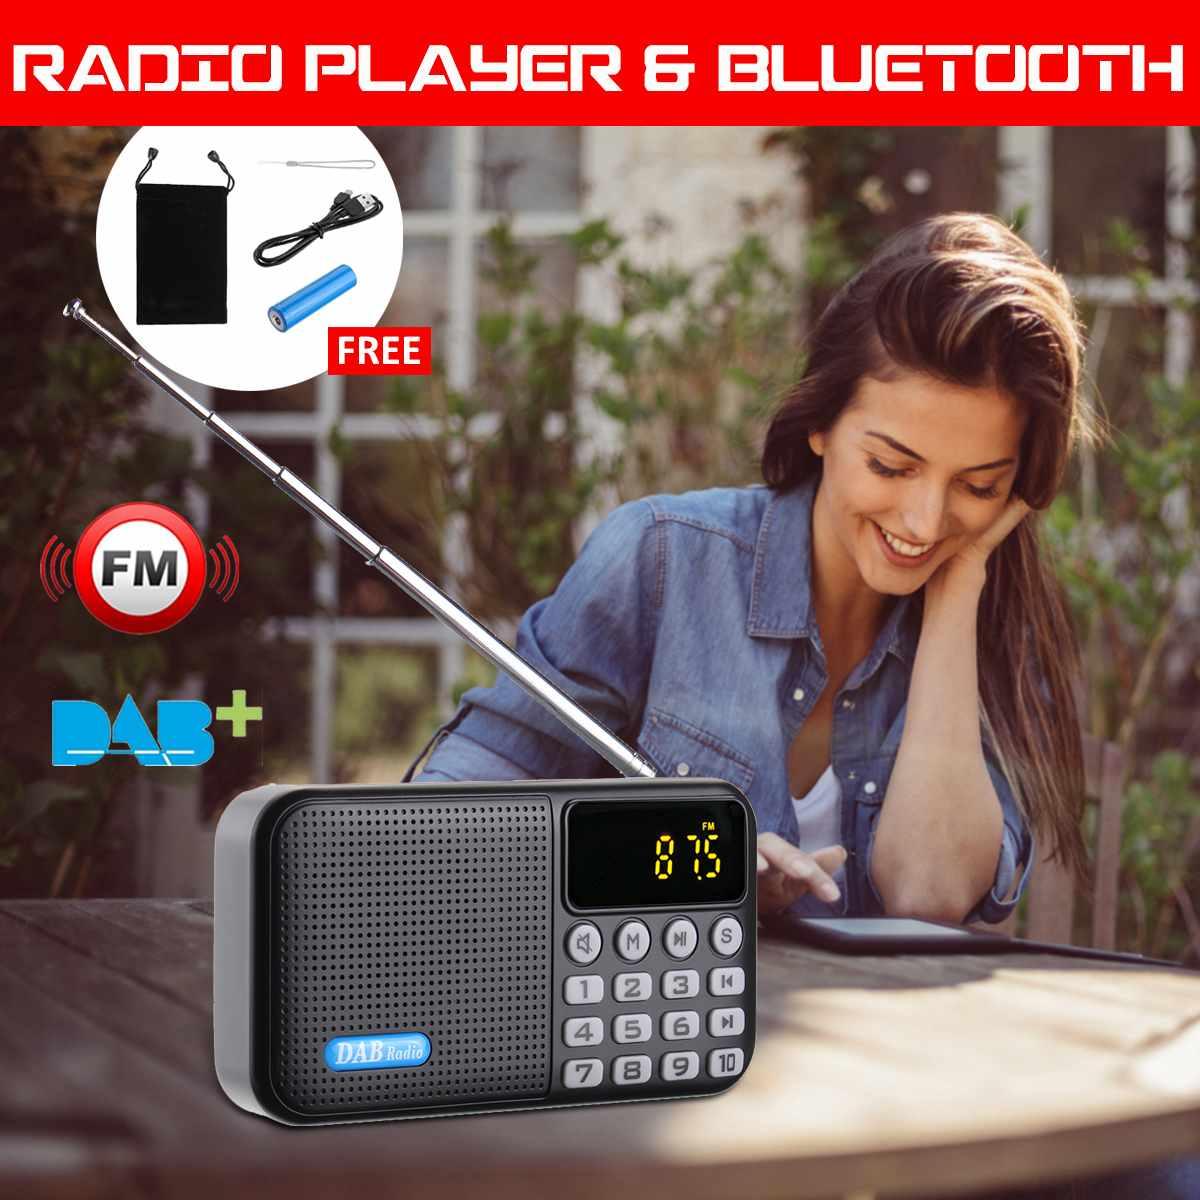 Digital DAB DAB+FM Radio Player Receiver With bluetooth Stereo Speaker Portable Outdoor FM Receiver Elder Christmas Birth Gift